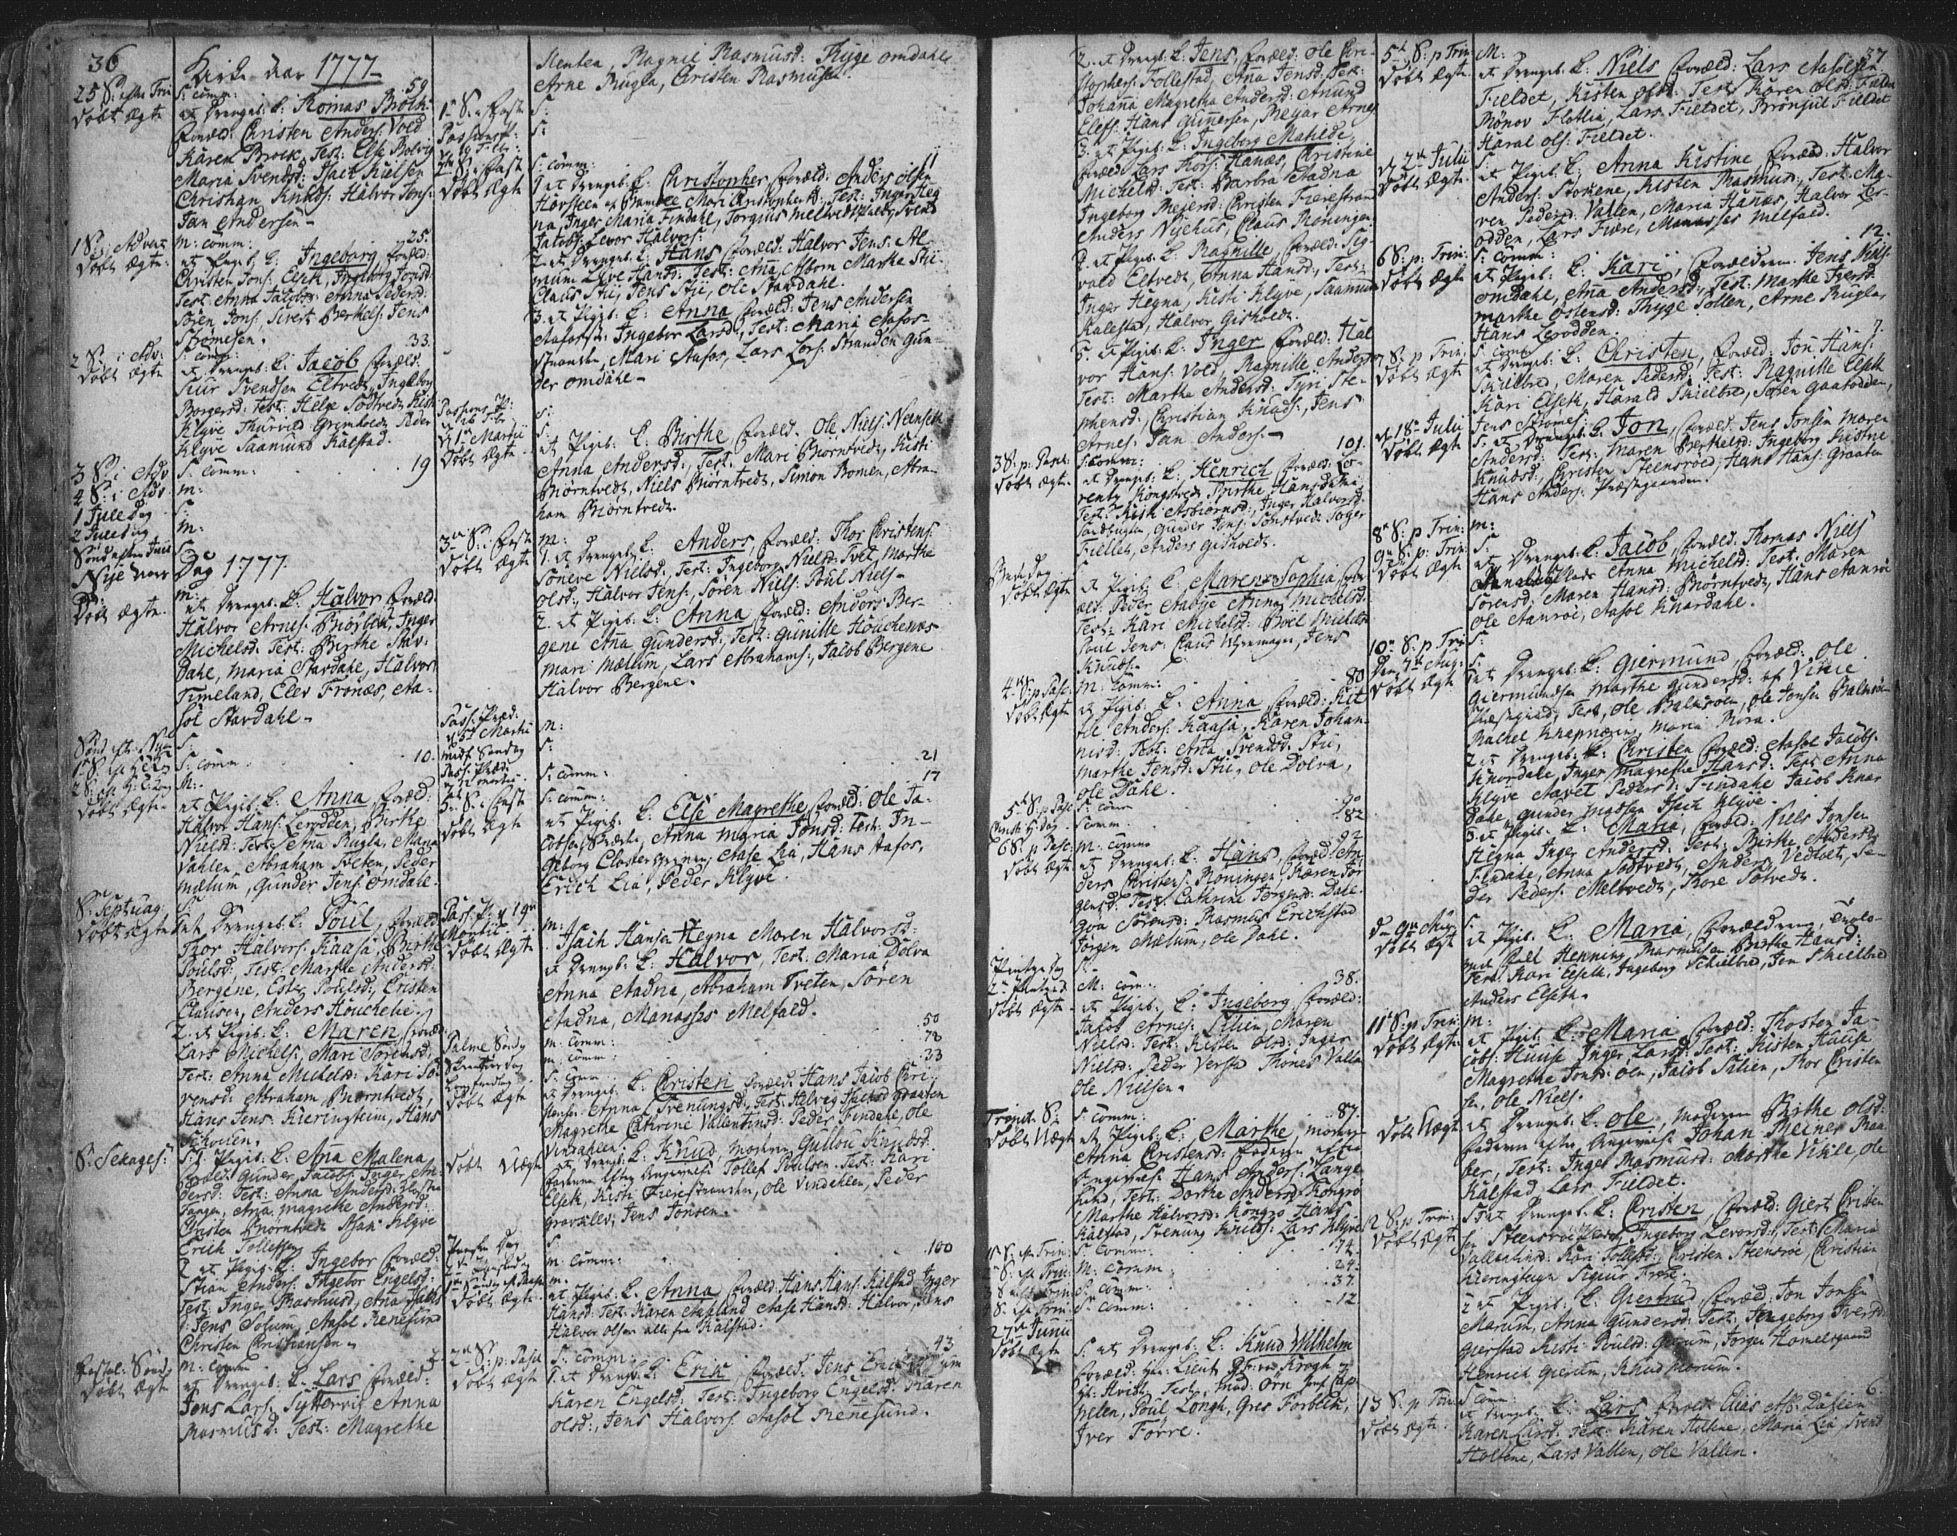 SAKO, Solum kirkebøker, F/Fa/L0003: Ministerialbok nr. I 3, 1761-1814, s. 36-37